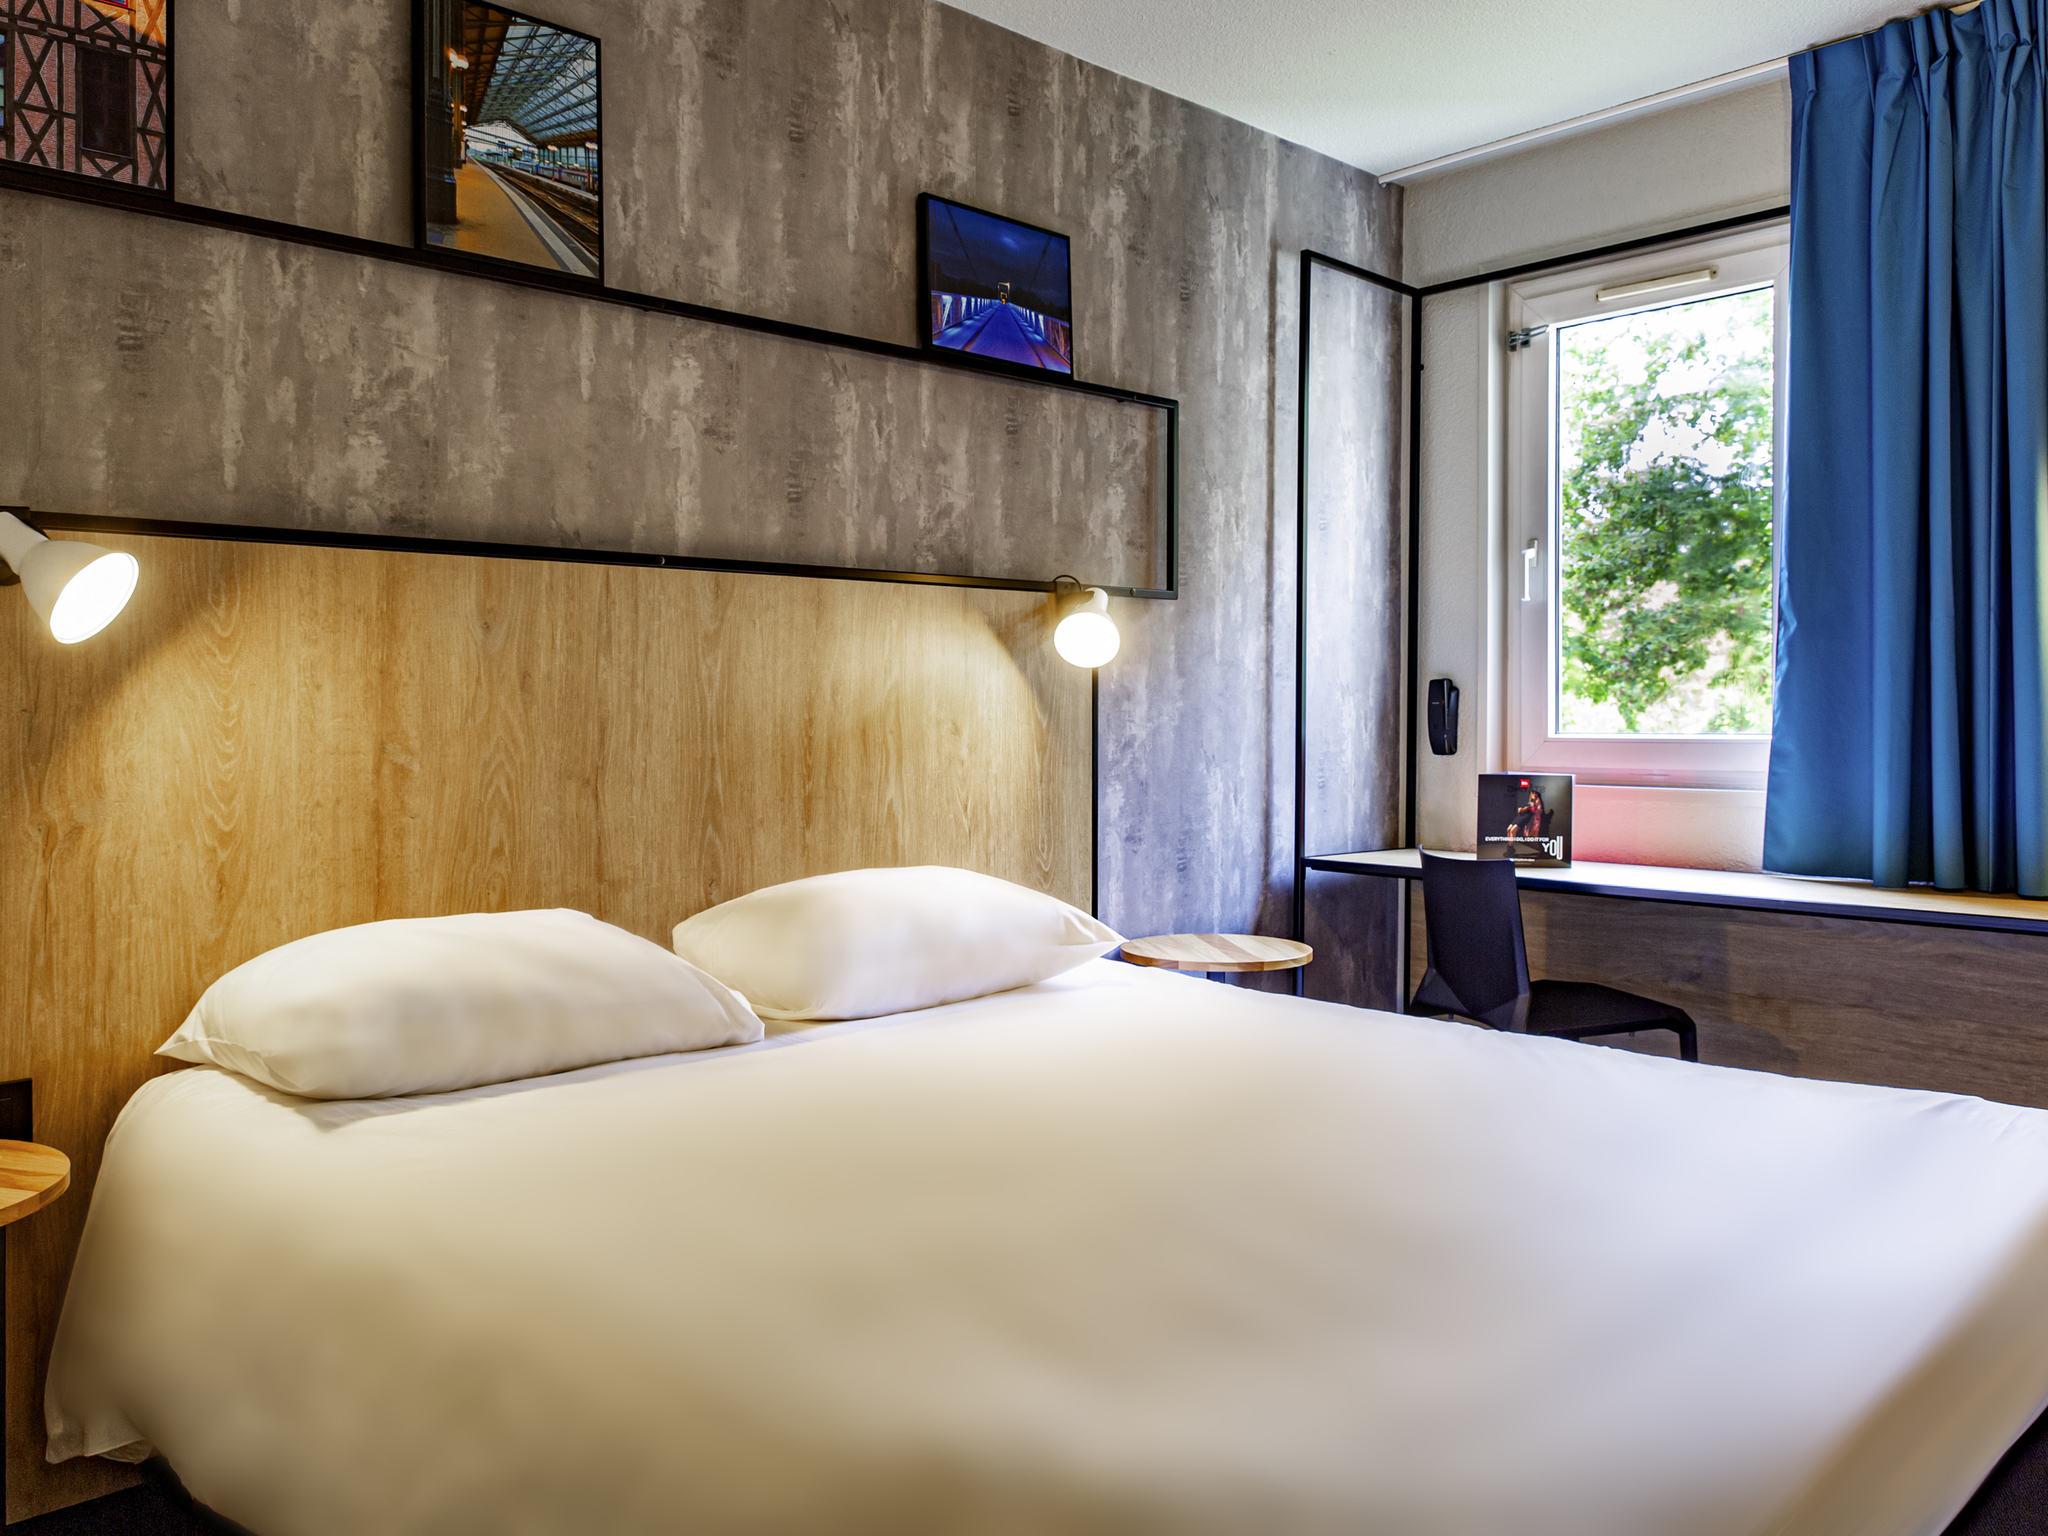 h tel chambray les tours ibis tours sud. Black Bedroom Furniture Sets. Home Design Ideas